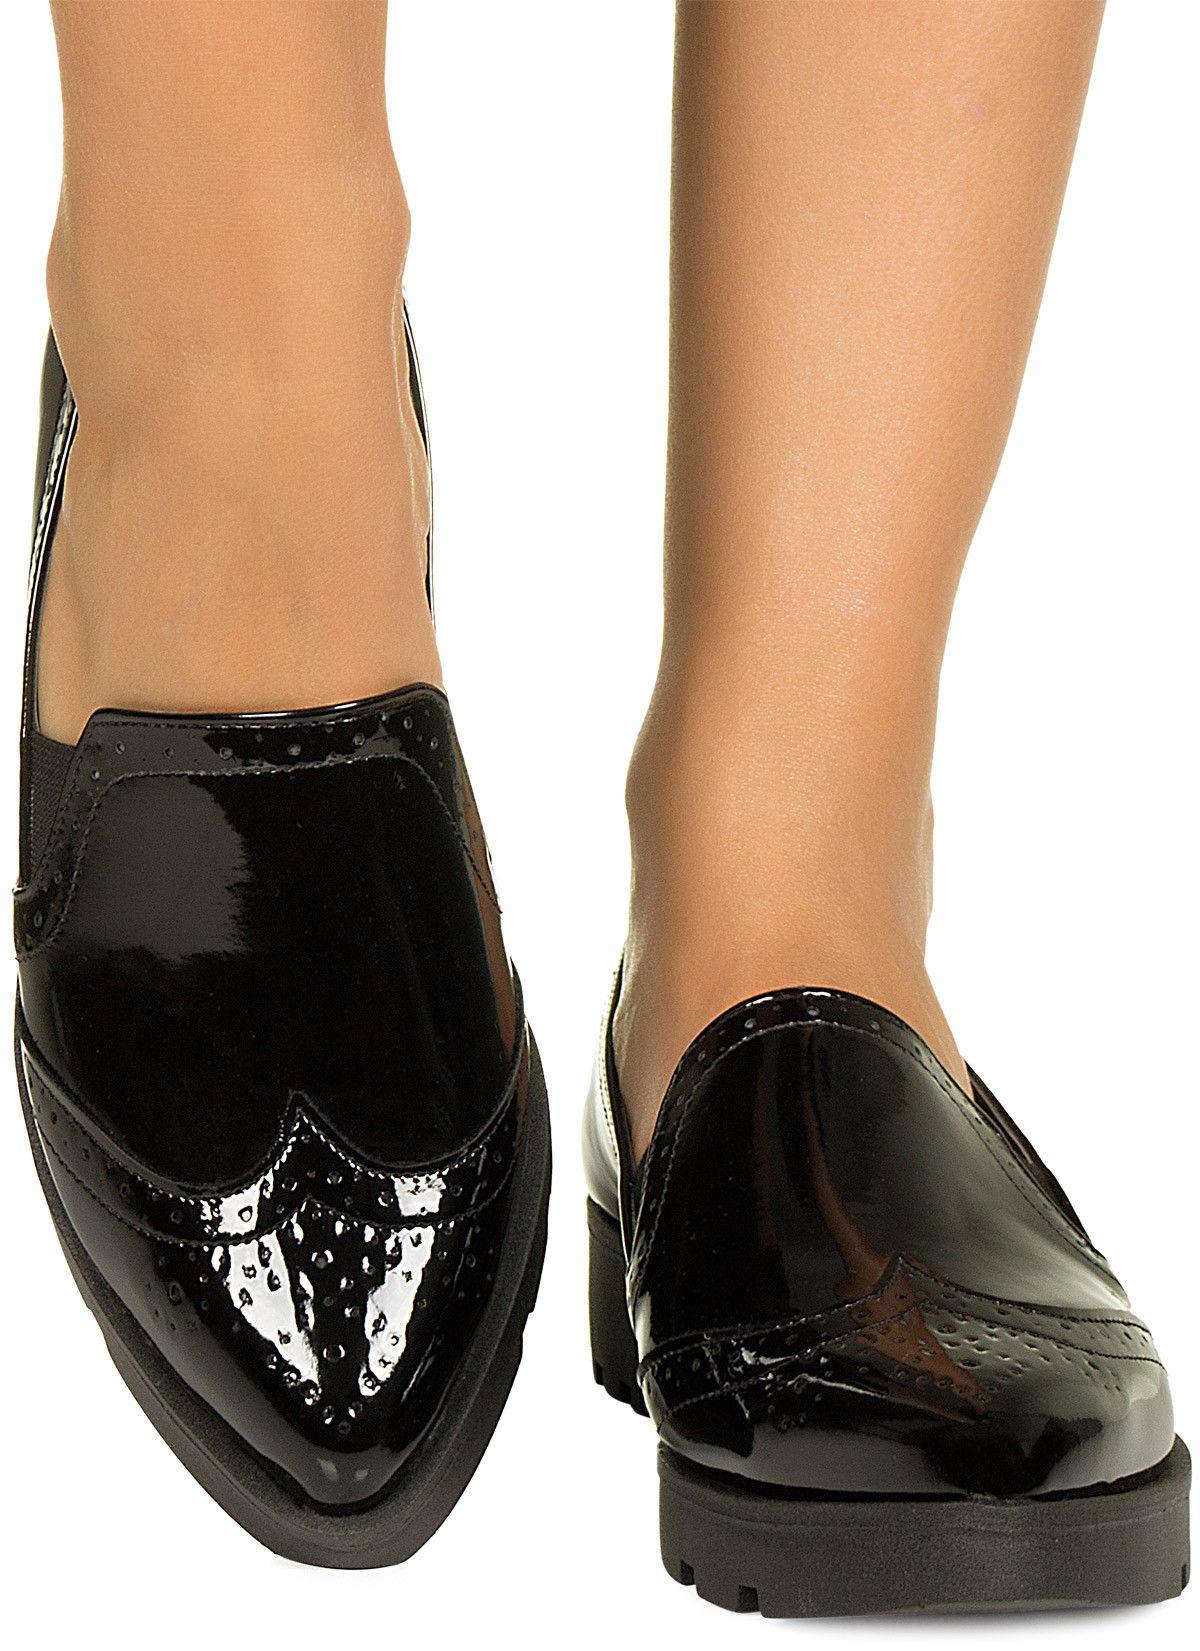 f2a0d7859 Oxford Preto Verniz Taquilla - Taquilla - Loja online de sapatos femininos